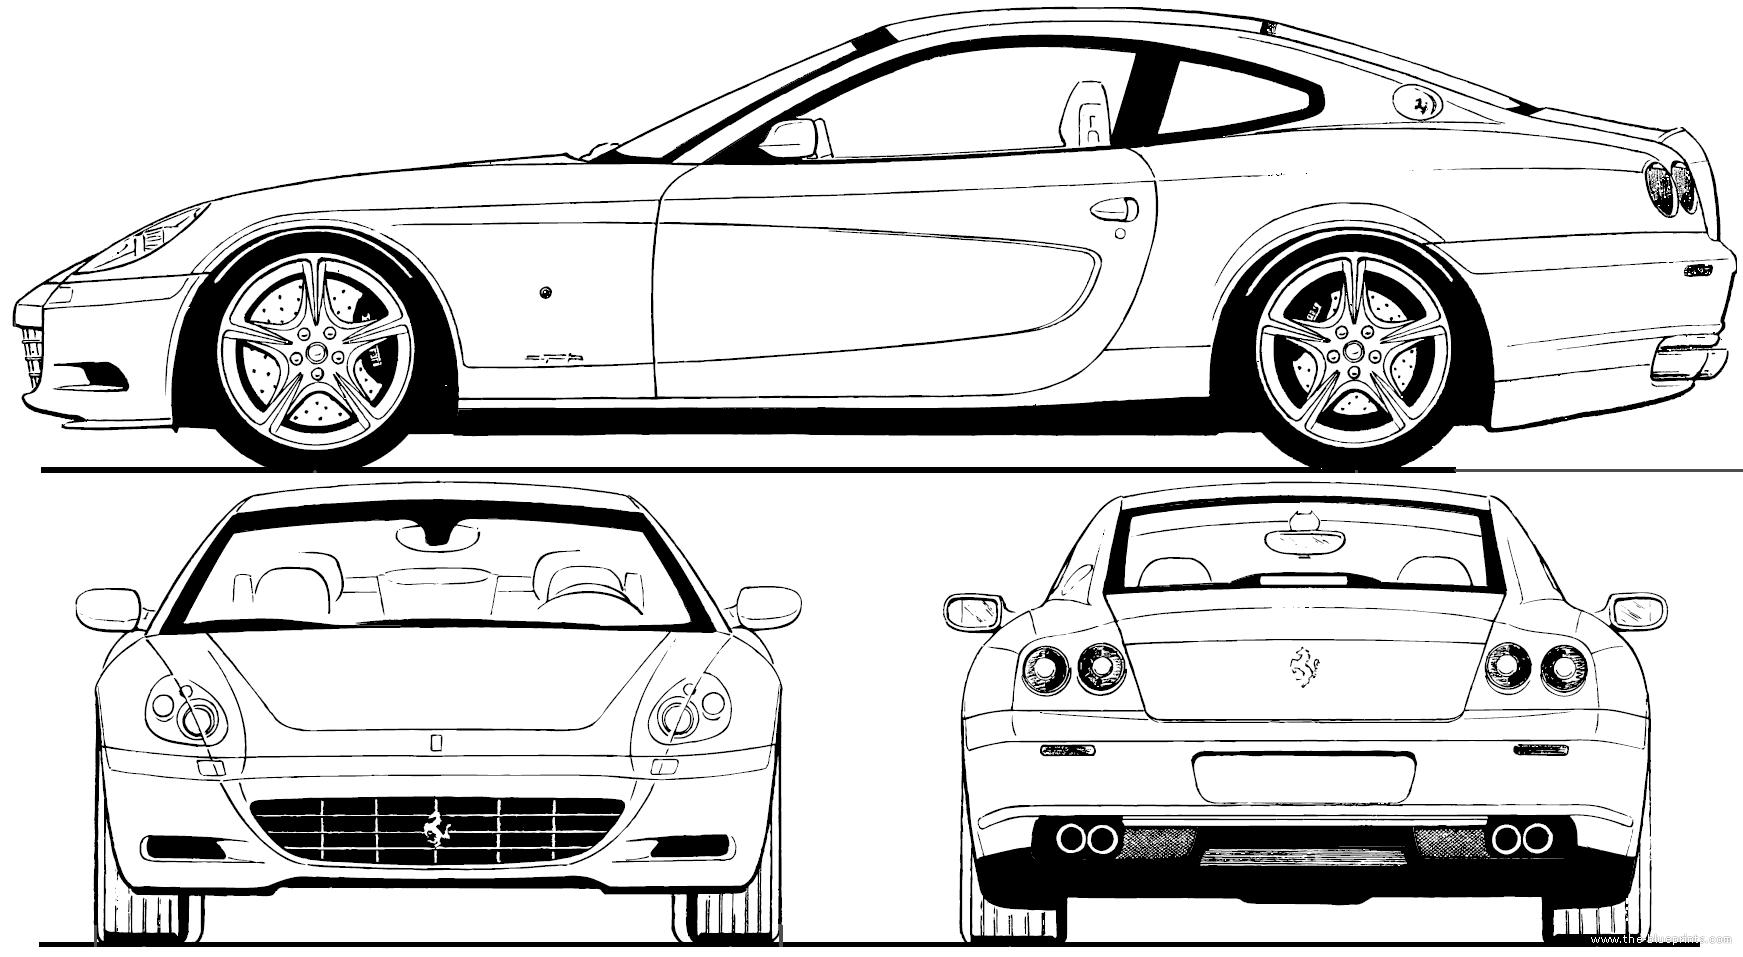 Blueprints > Cars > Ferrari > Ferrari 612 Scaglietti (2006)